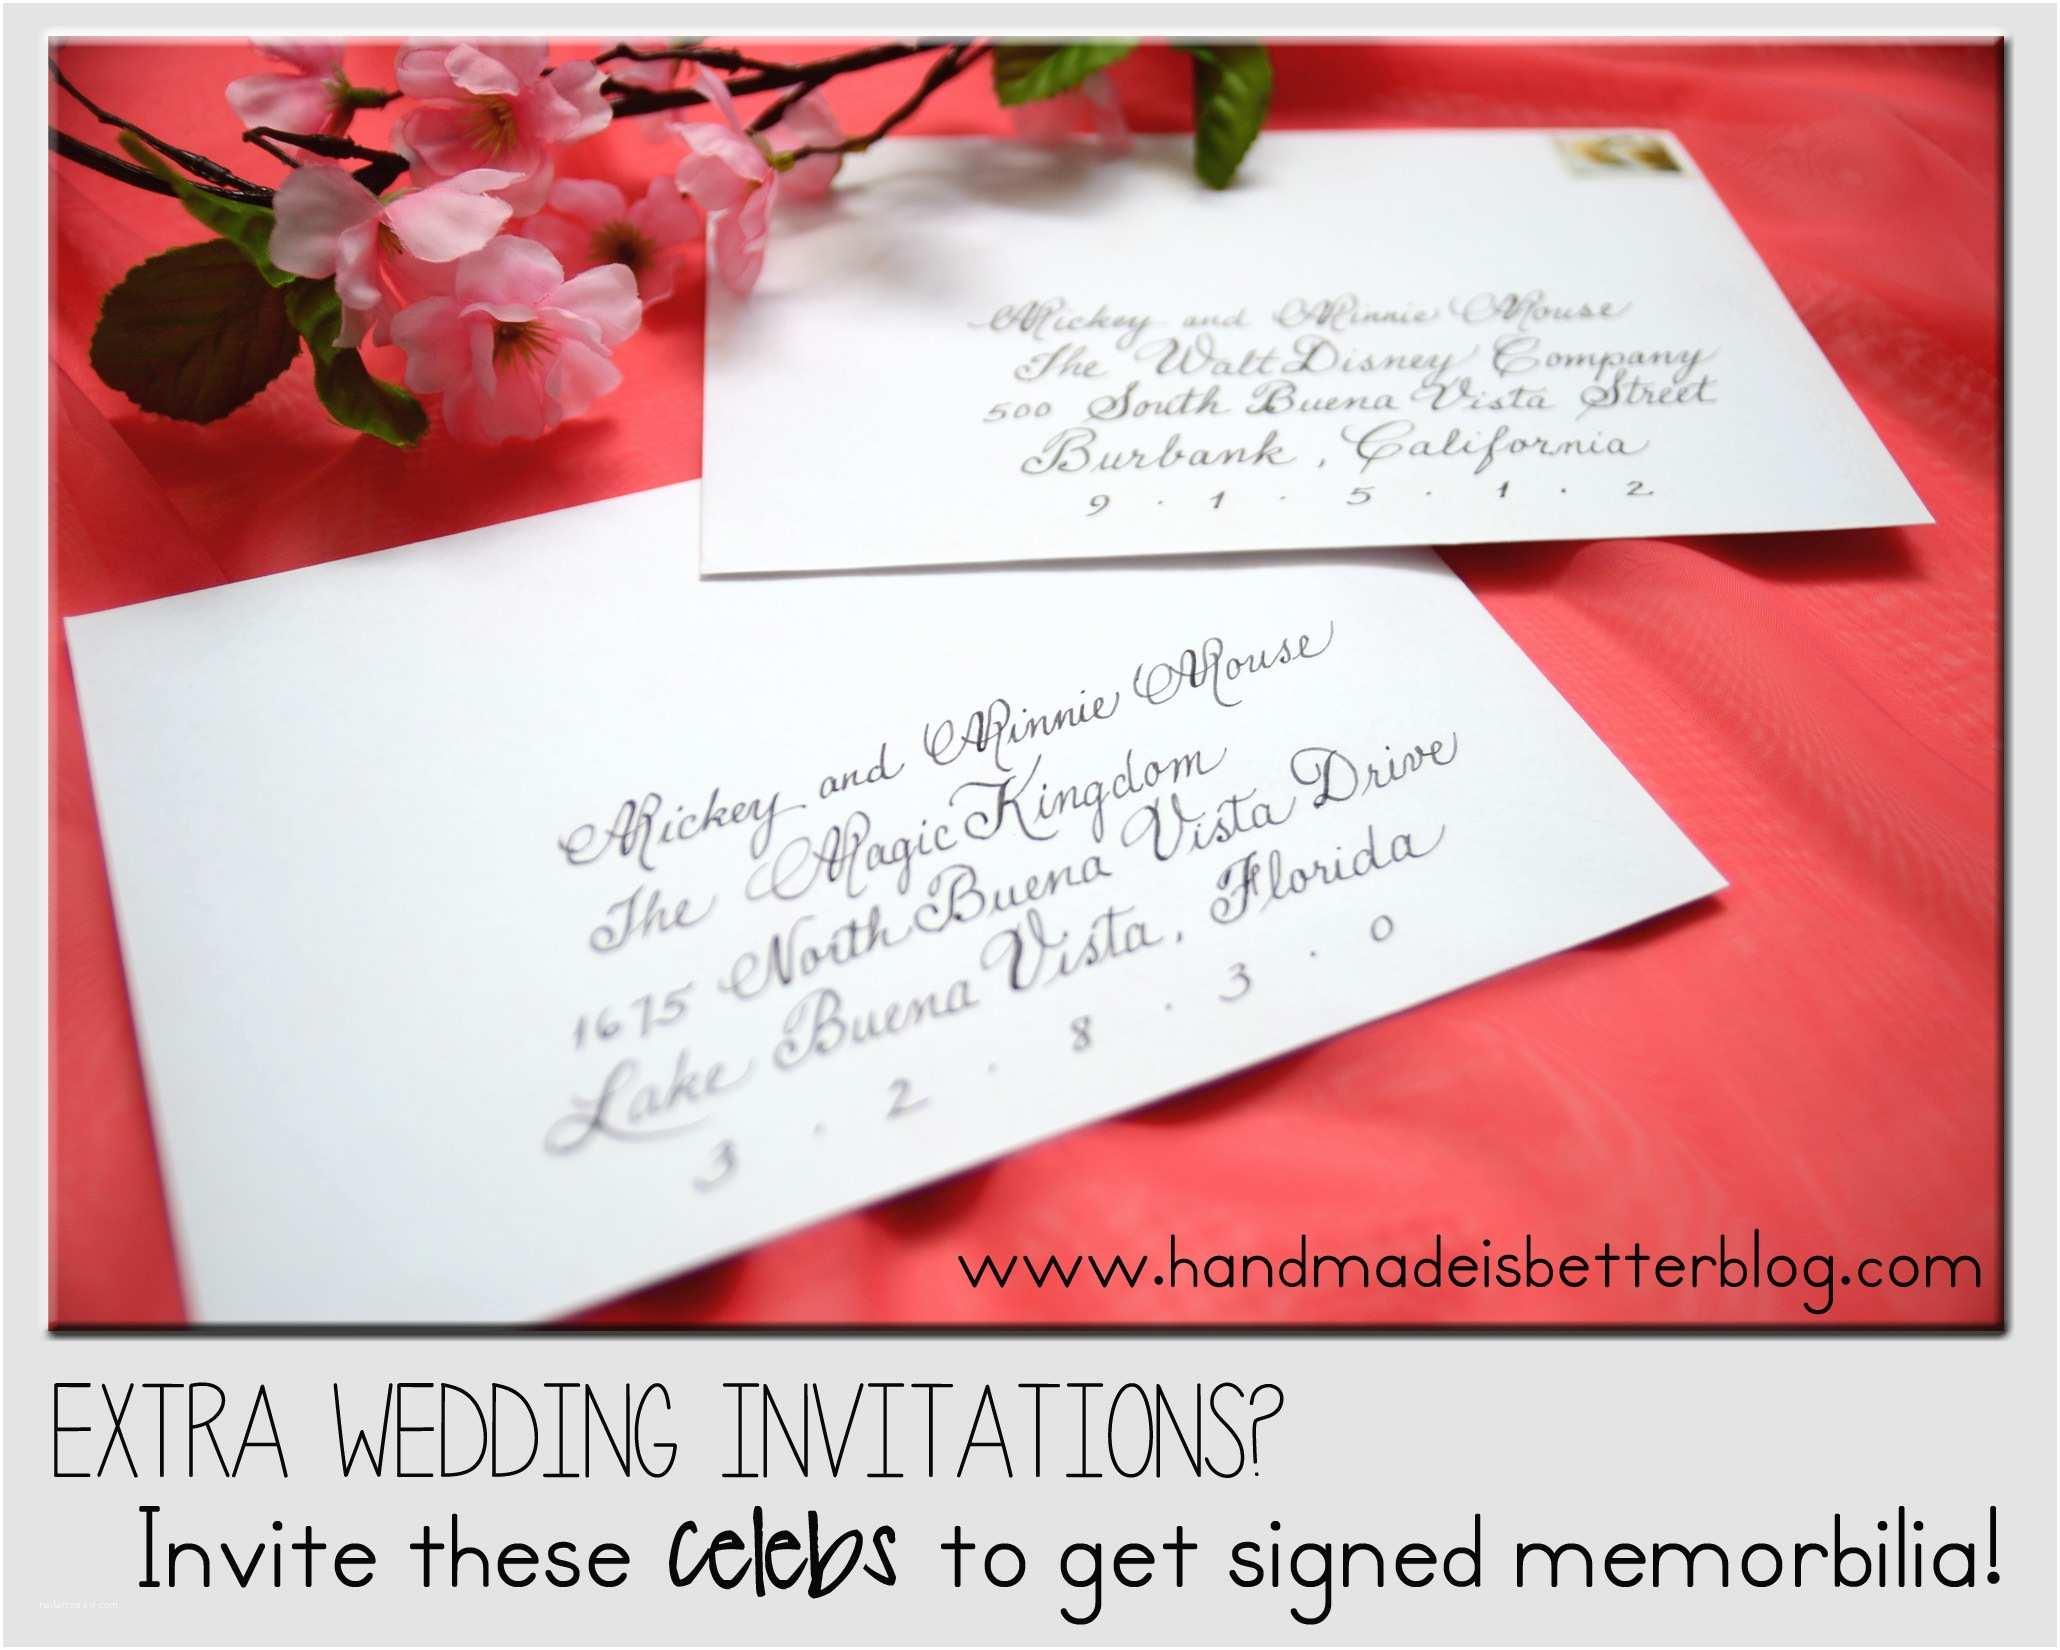 Mickey and Minnie Wedding Invitation Extra Wedding Invitations Invite these Celebrities to Get